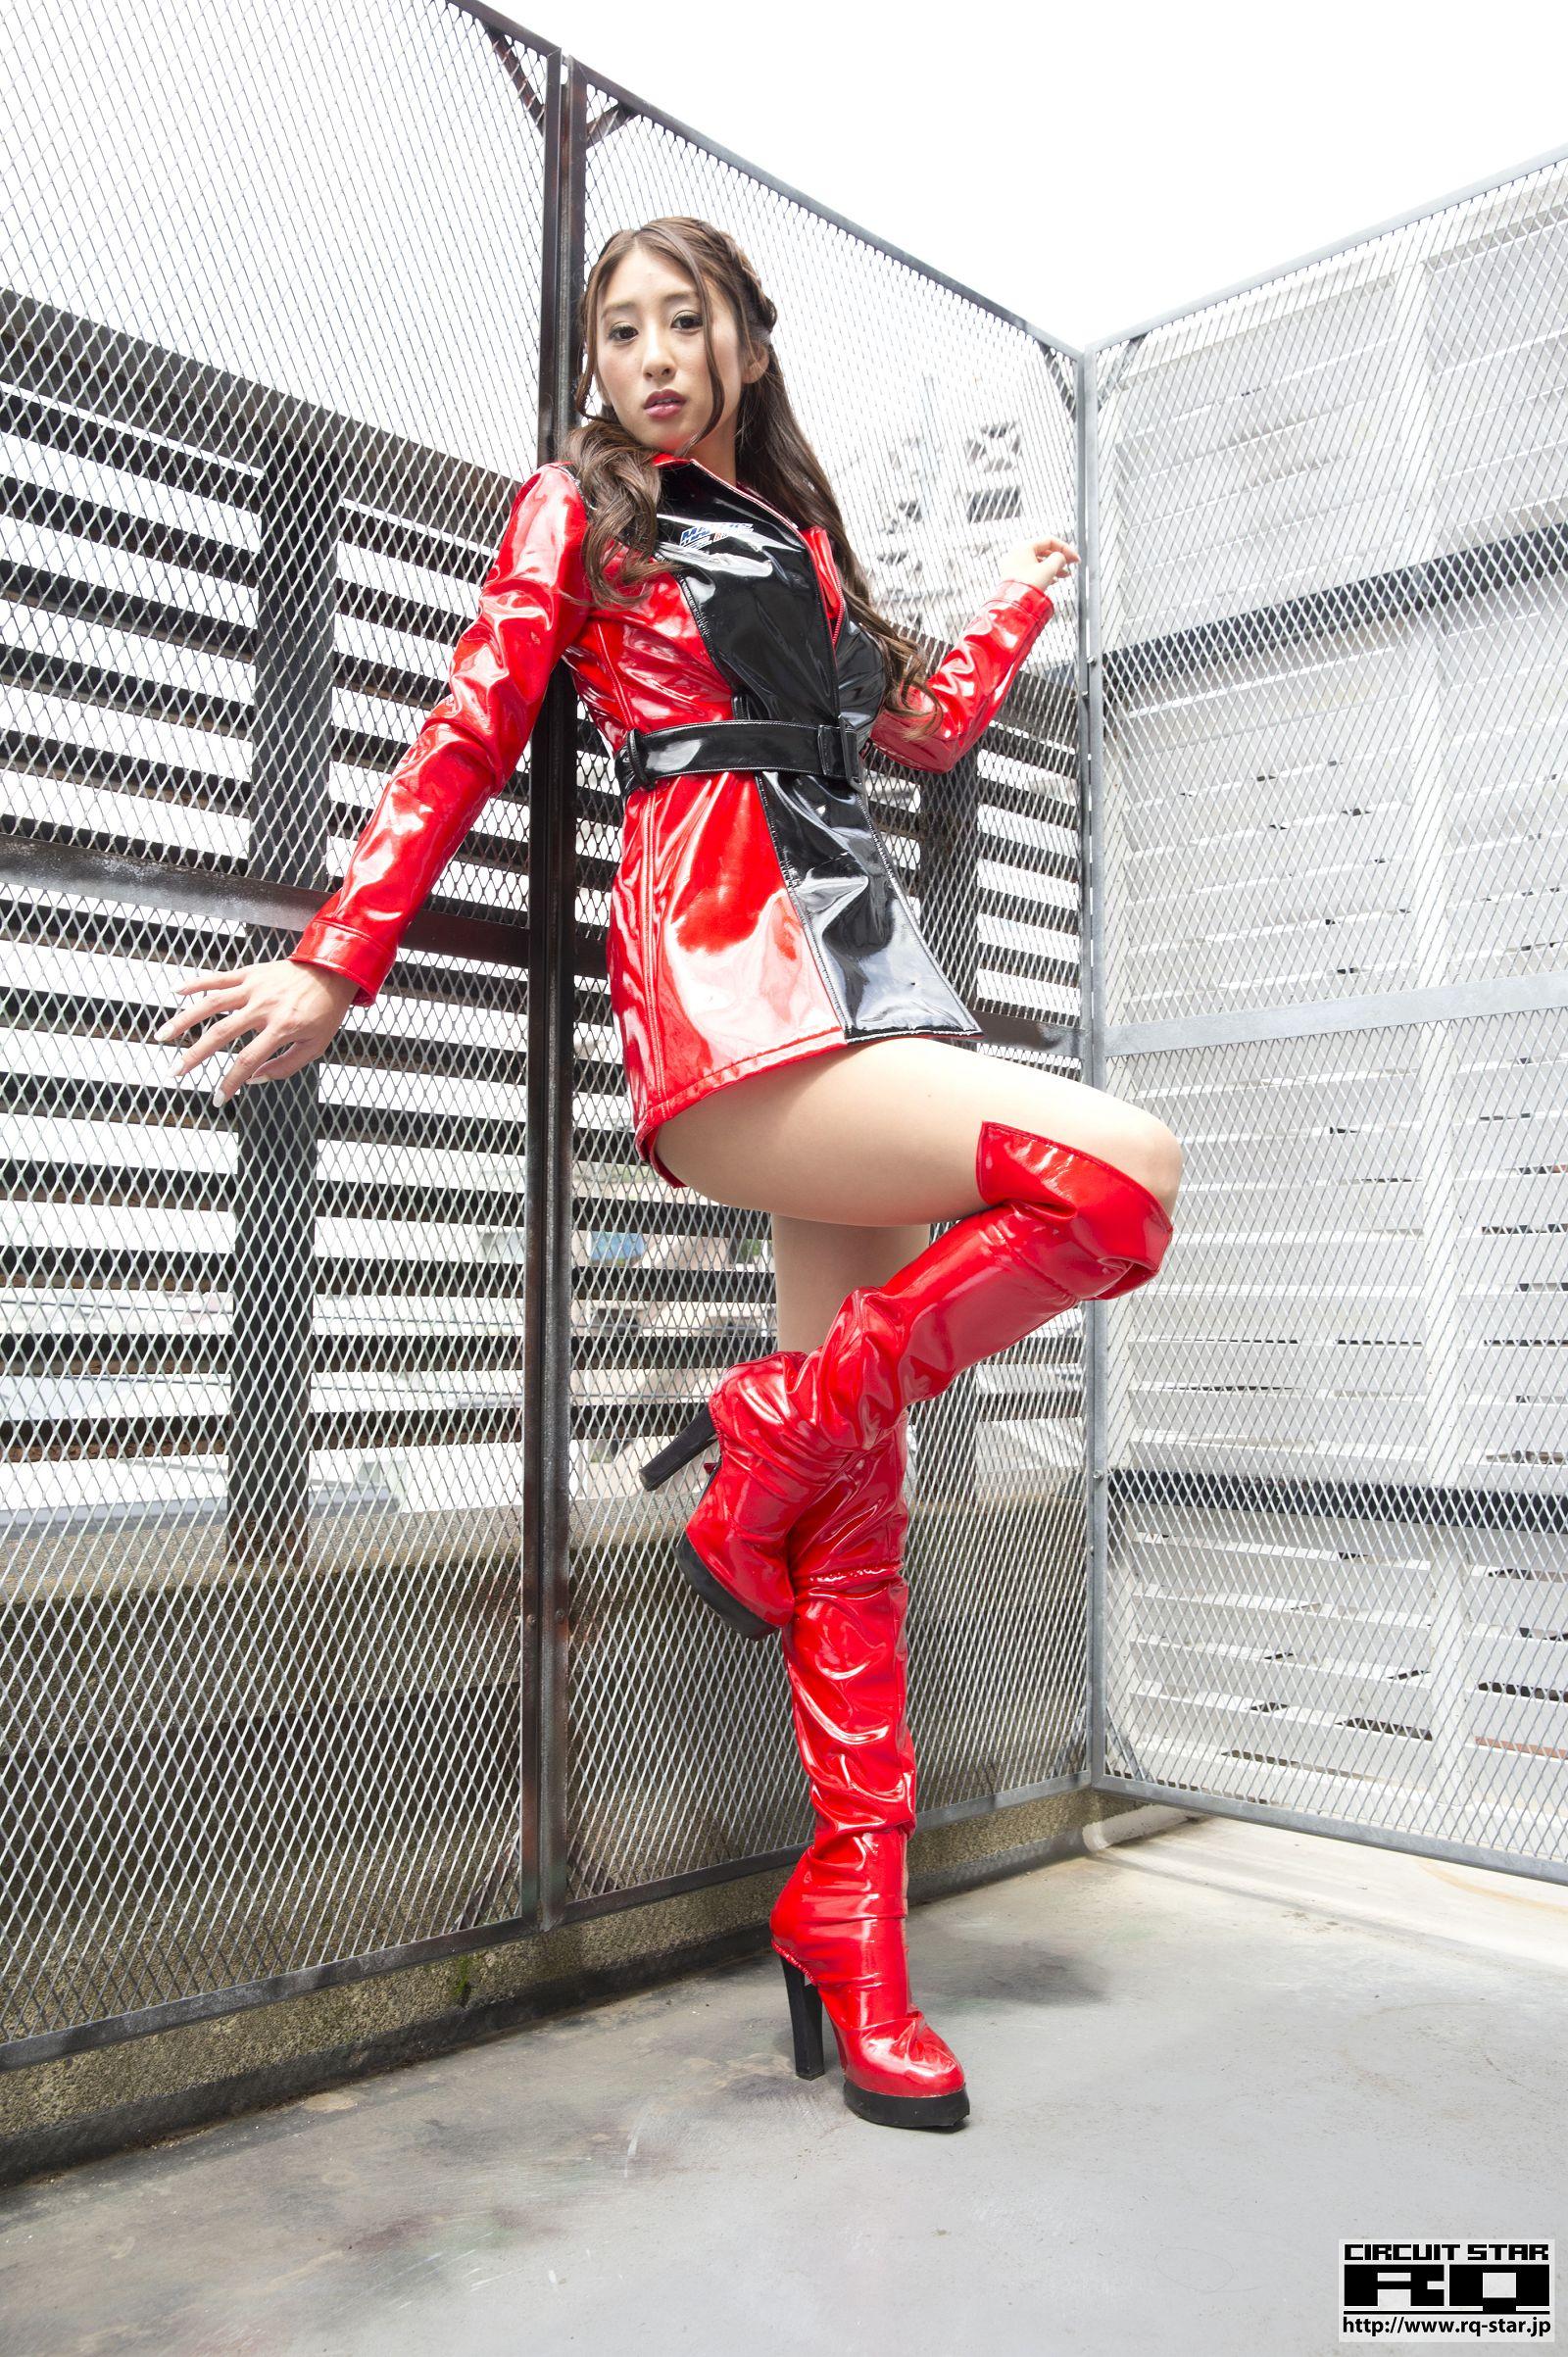 [RQ STAR美女] NO.01029 Eriko Sato 佐藤衣里子 Race Queen[70P] RQ STAR 第1张